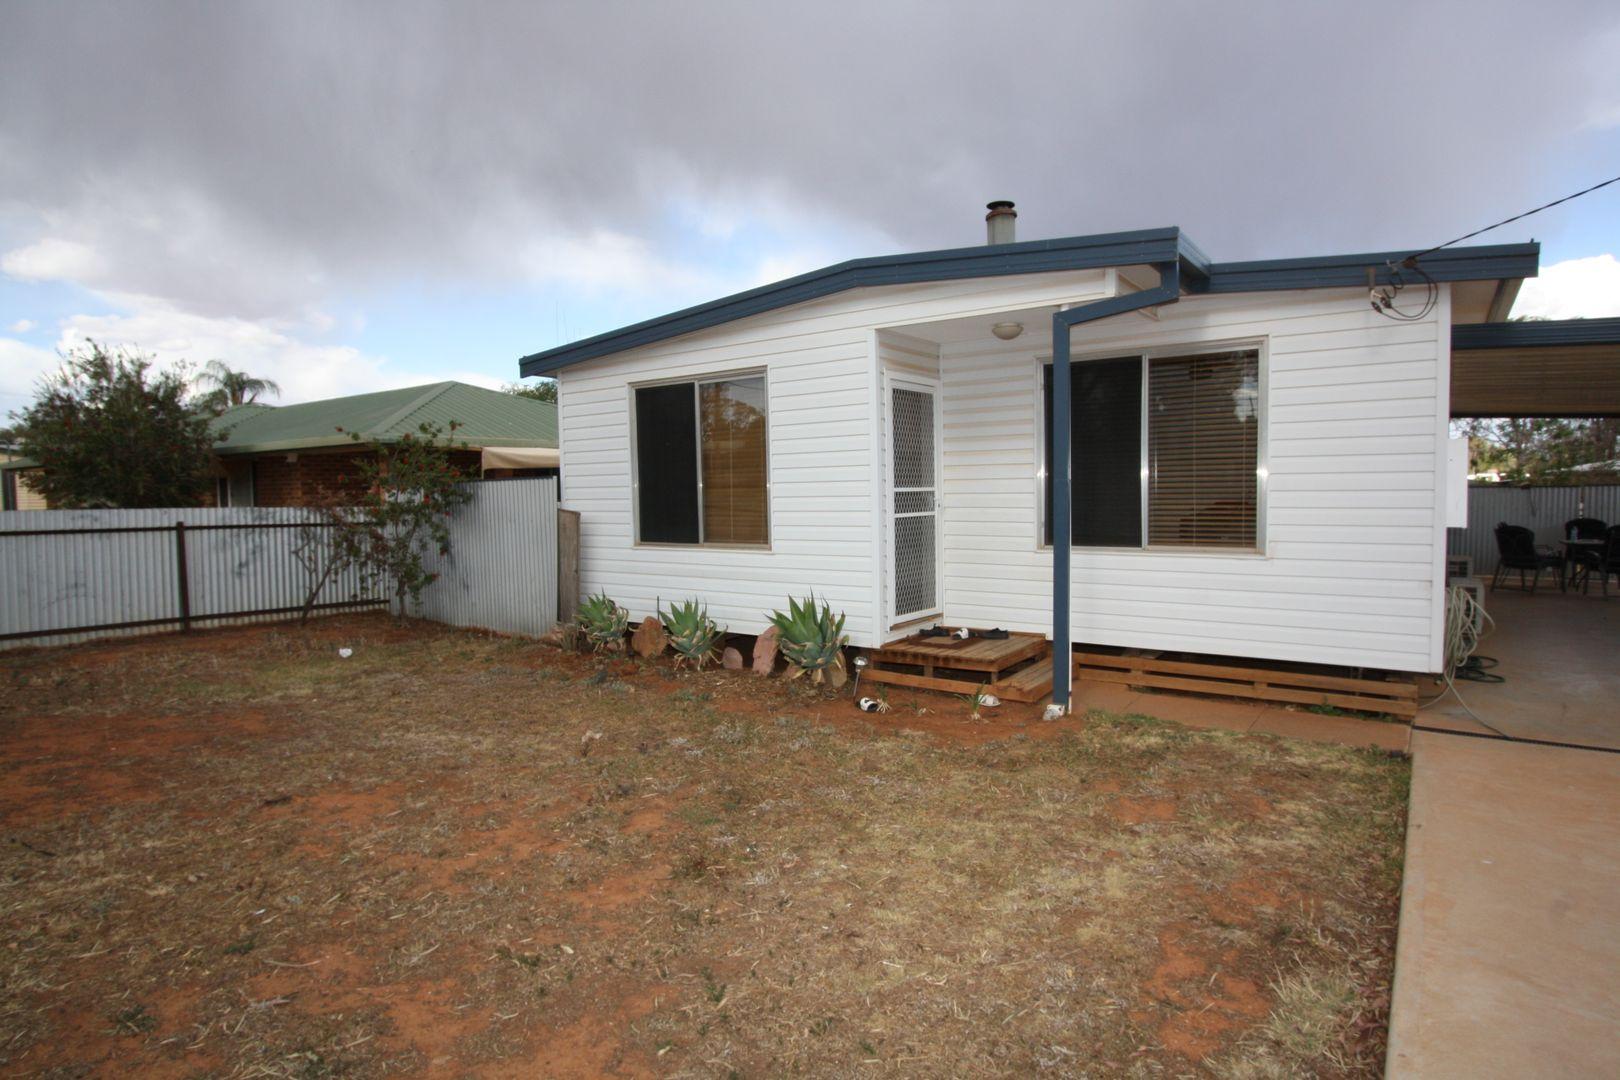 14 Woodiwiss Avenue, Cobar NSW 2835, Image 0